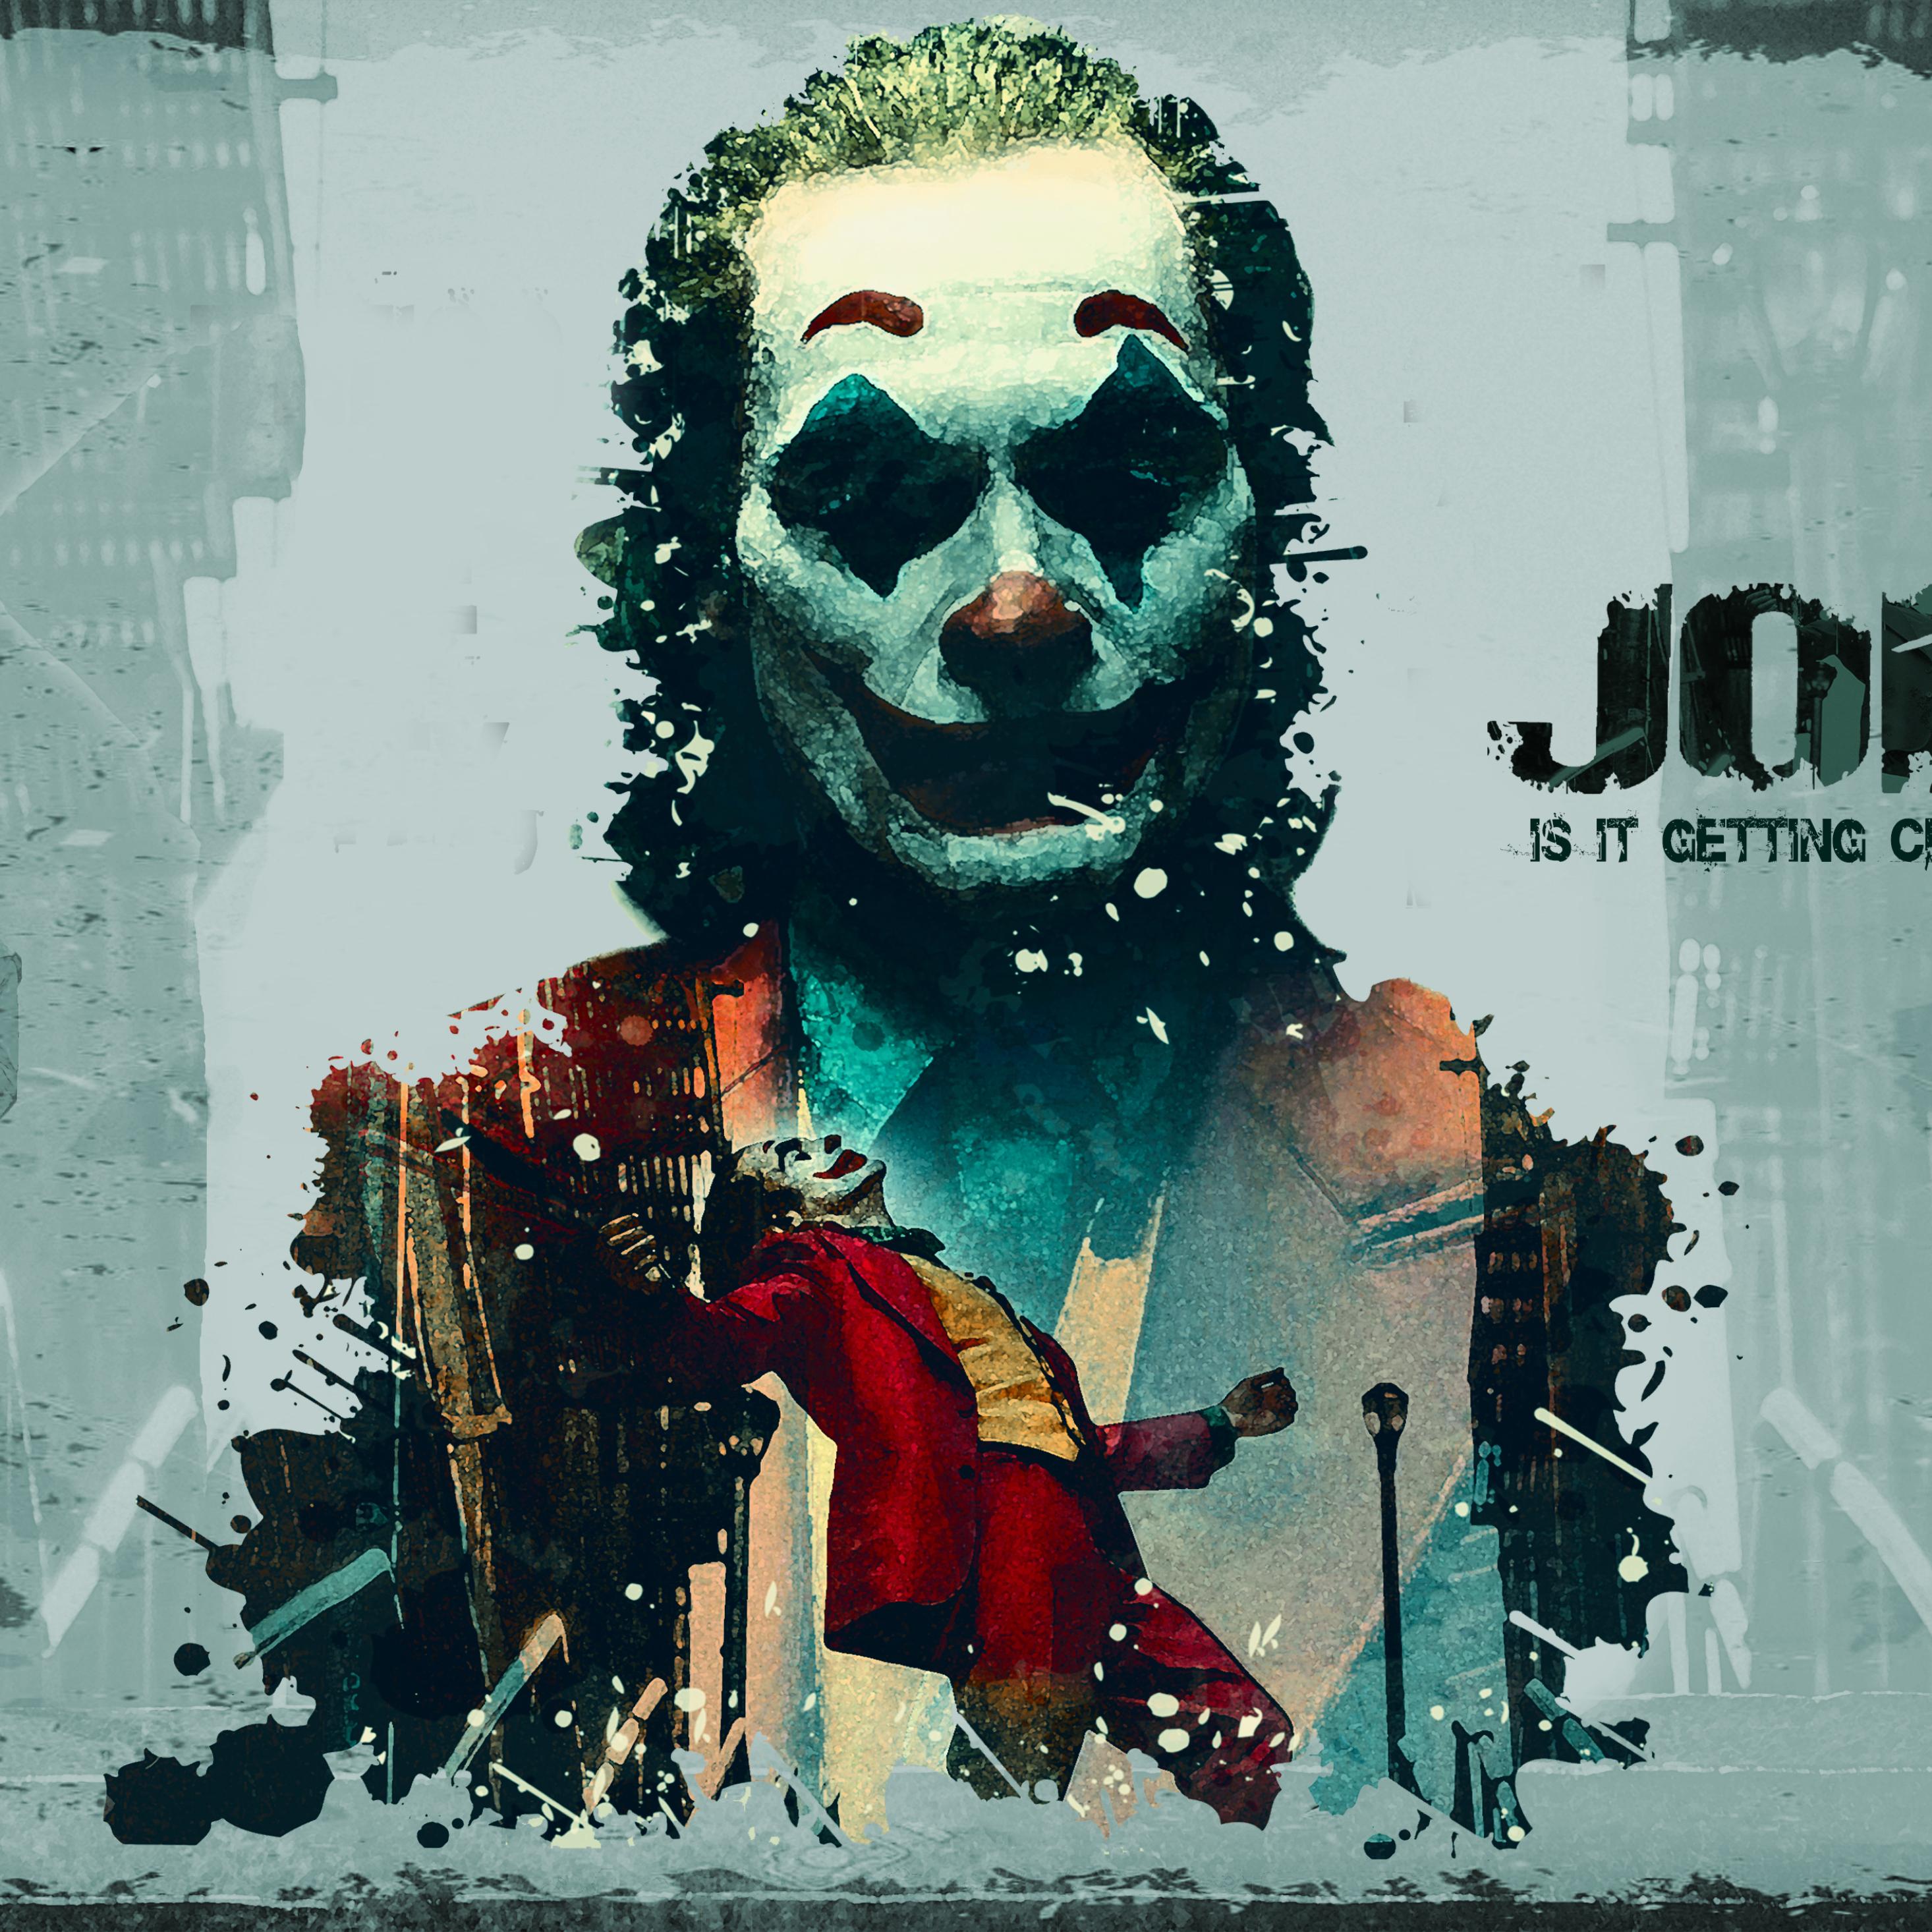 2932x2932 Joker 2019 Movie Ipad Pro Retina Display ...